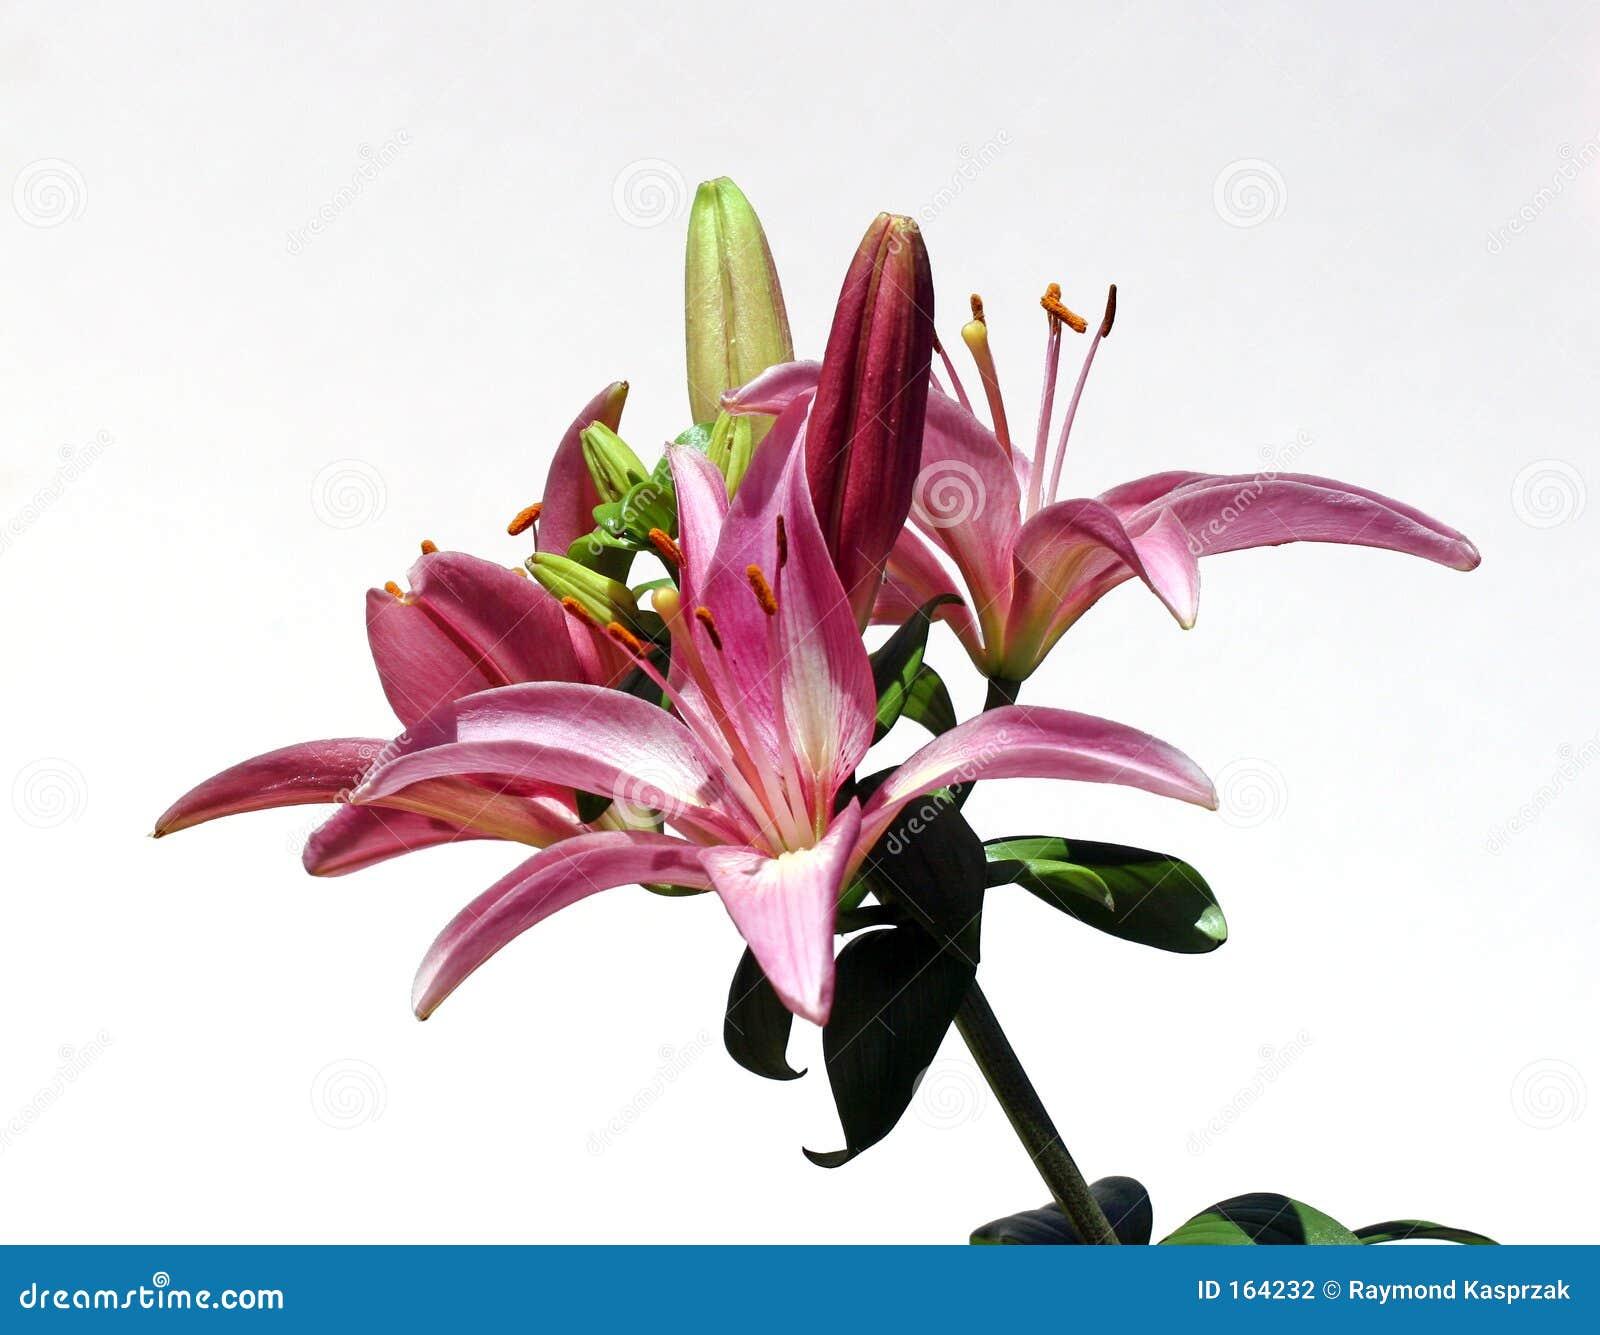 Star Burst Lily